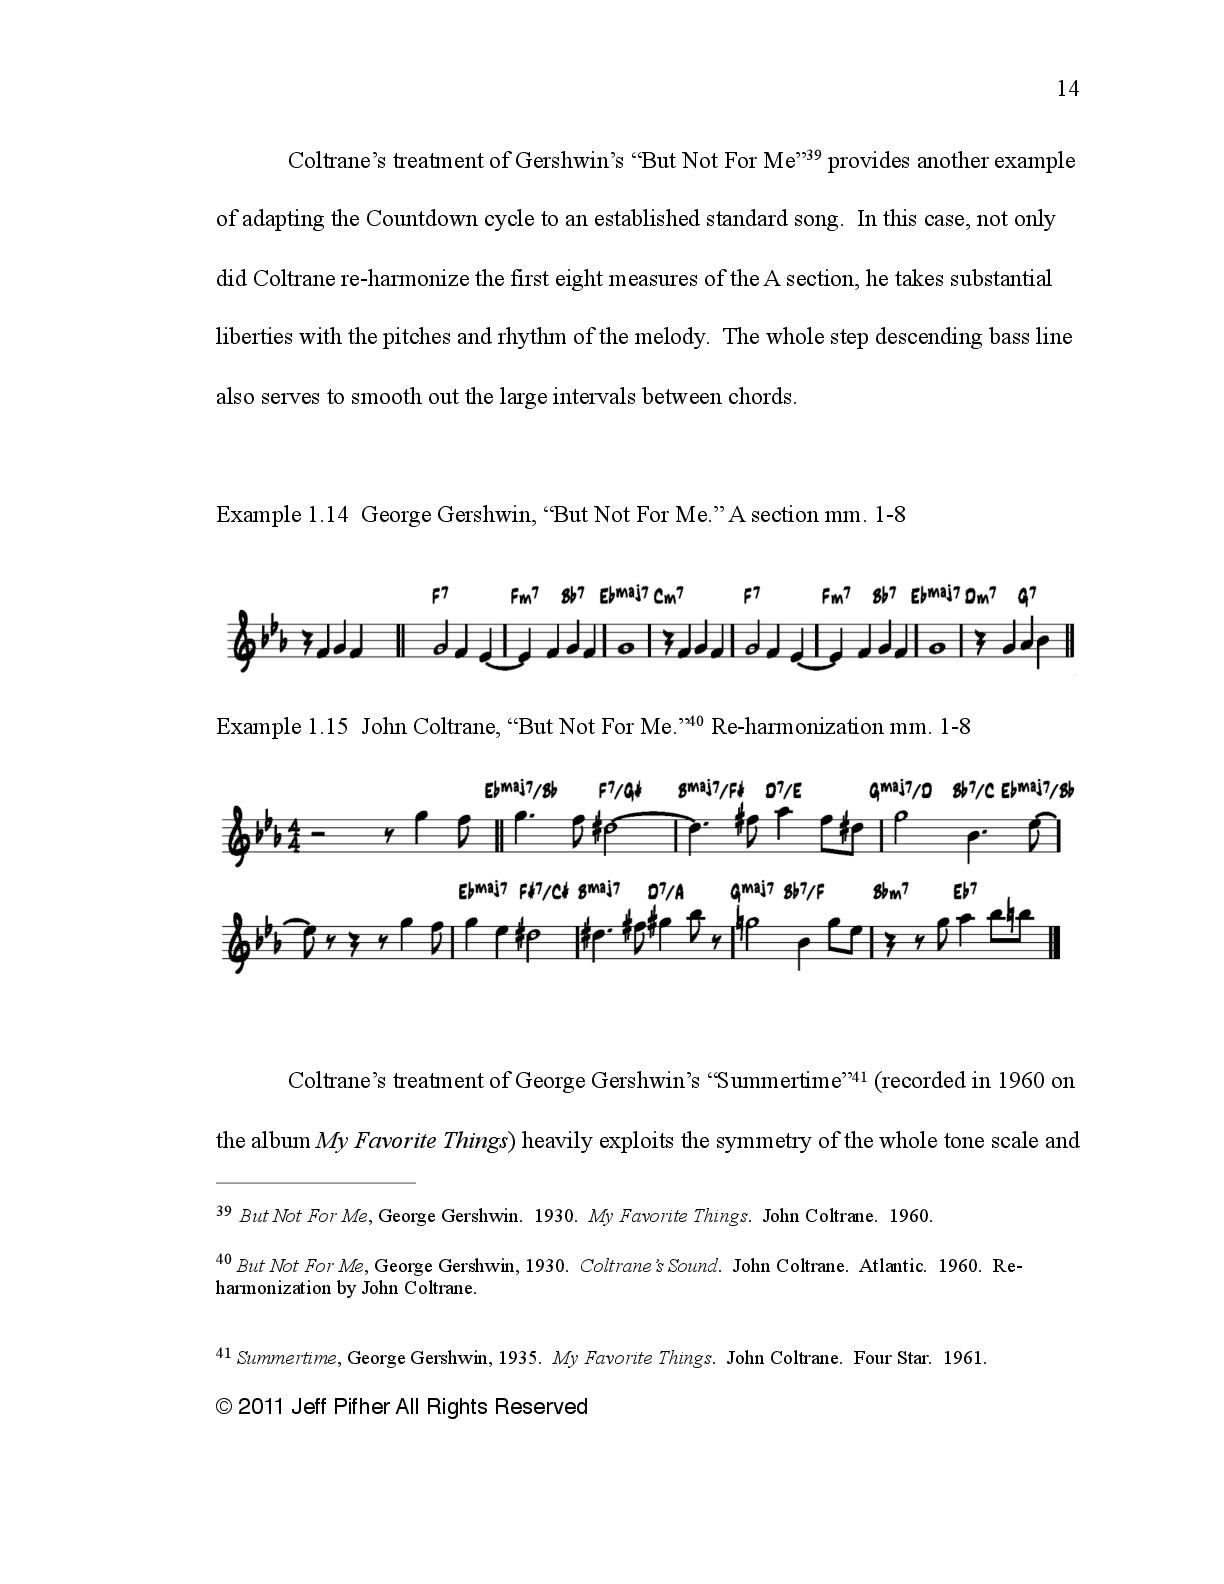 Jeff-Pifher-Academic-Series-Coltrane-Cycles-014.jpg